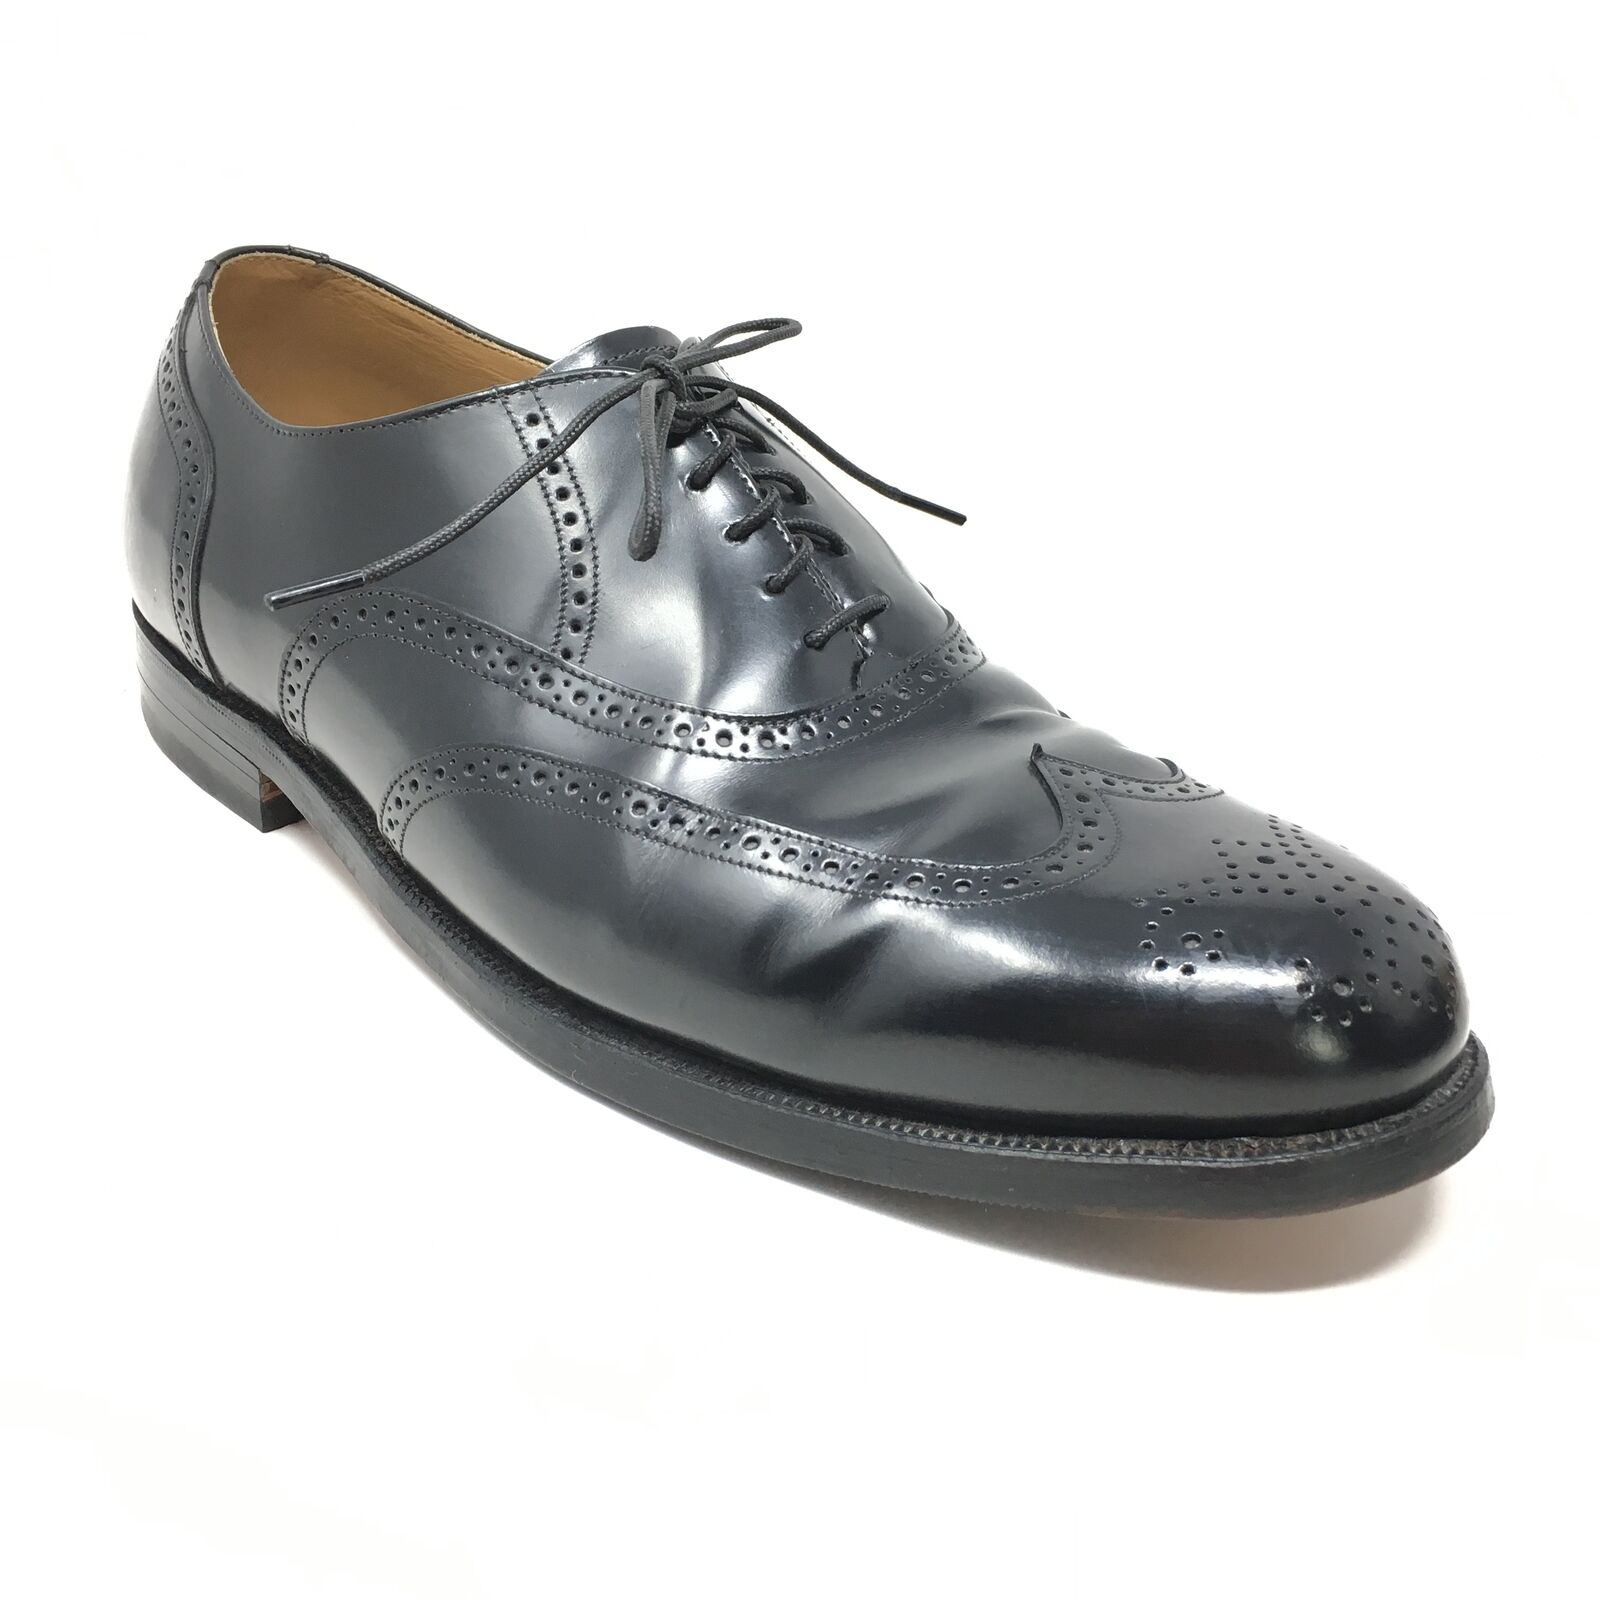 Men's Johnston & Murphy Waverly Oxfords Dress Shoes Size 12 Black Leather AJ4